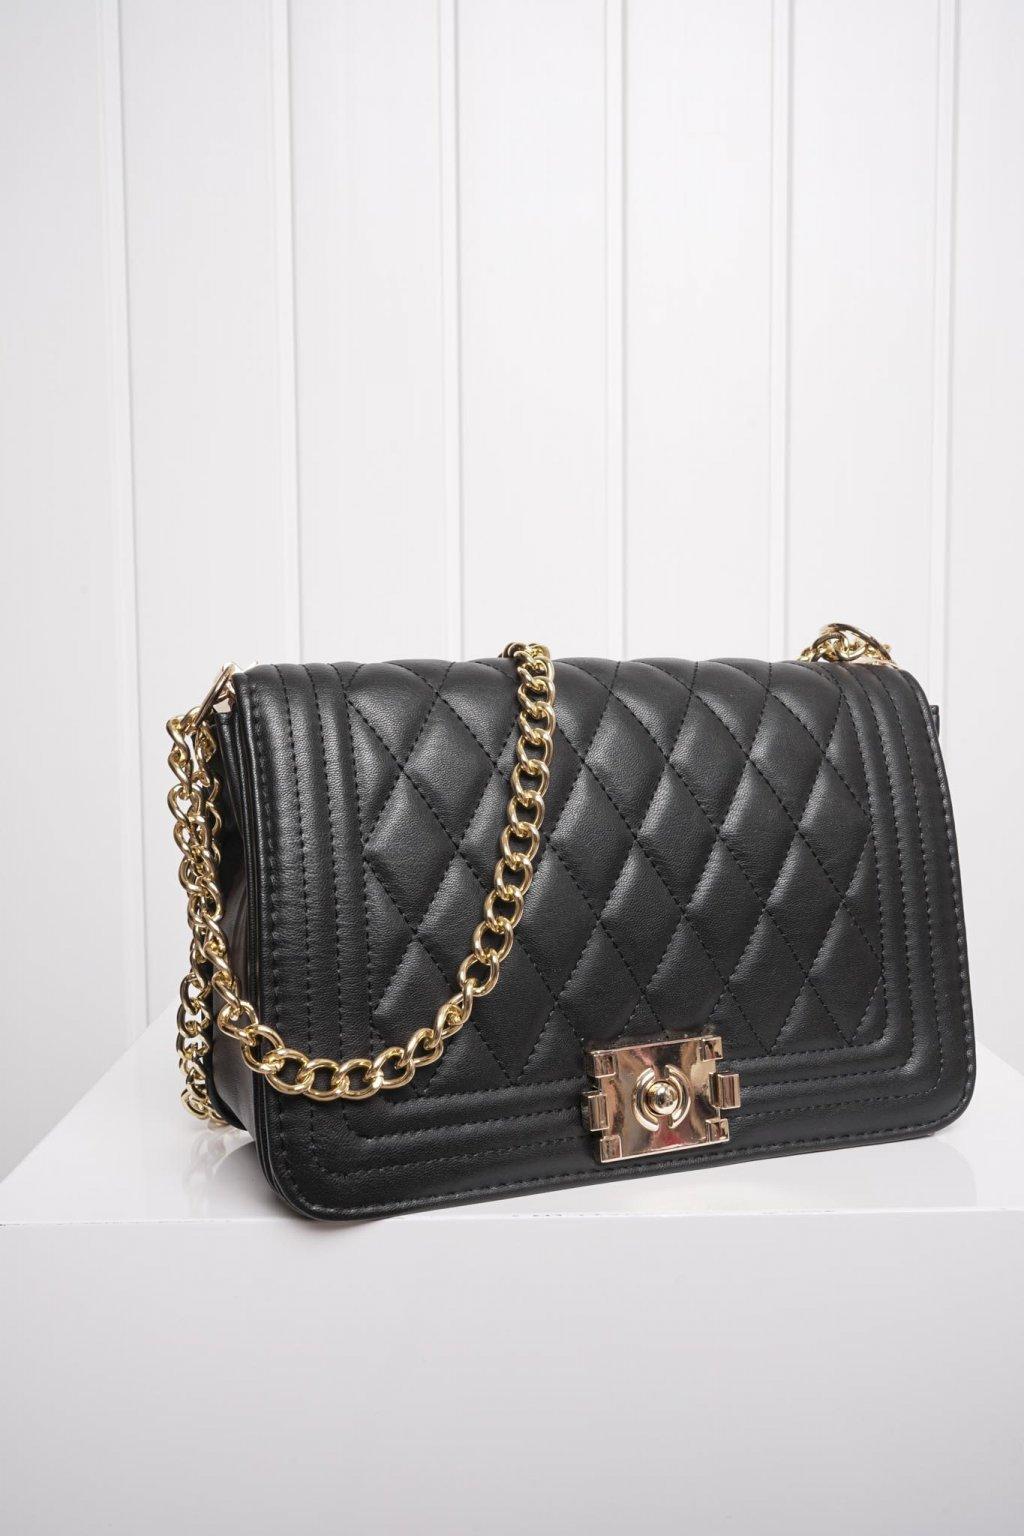 Kabelka, ruksak, dobrá cena, čierna kabelka, čierny ruksak, basic, kabelky, ruksaky 08